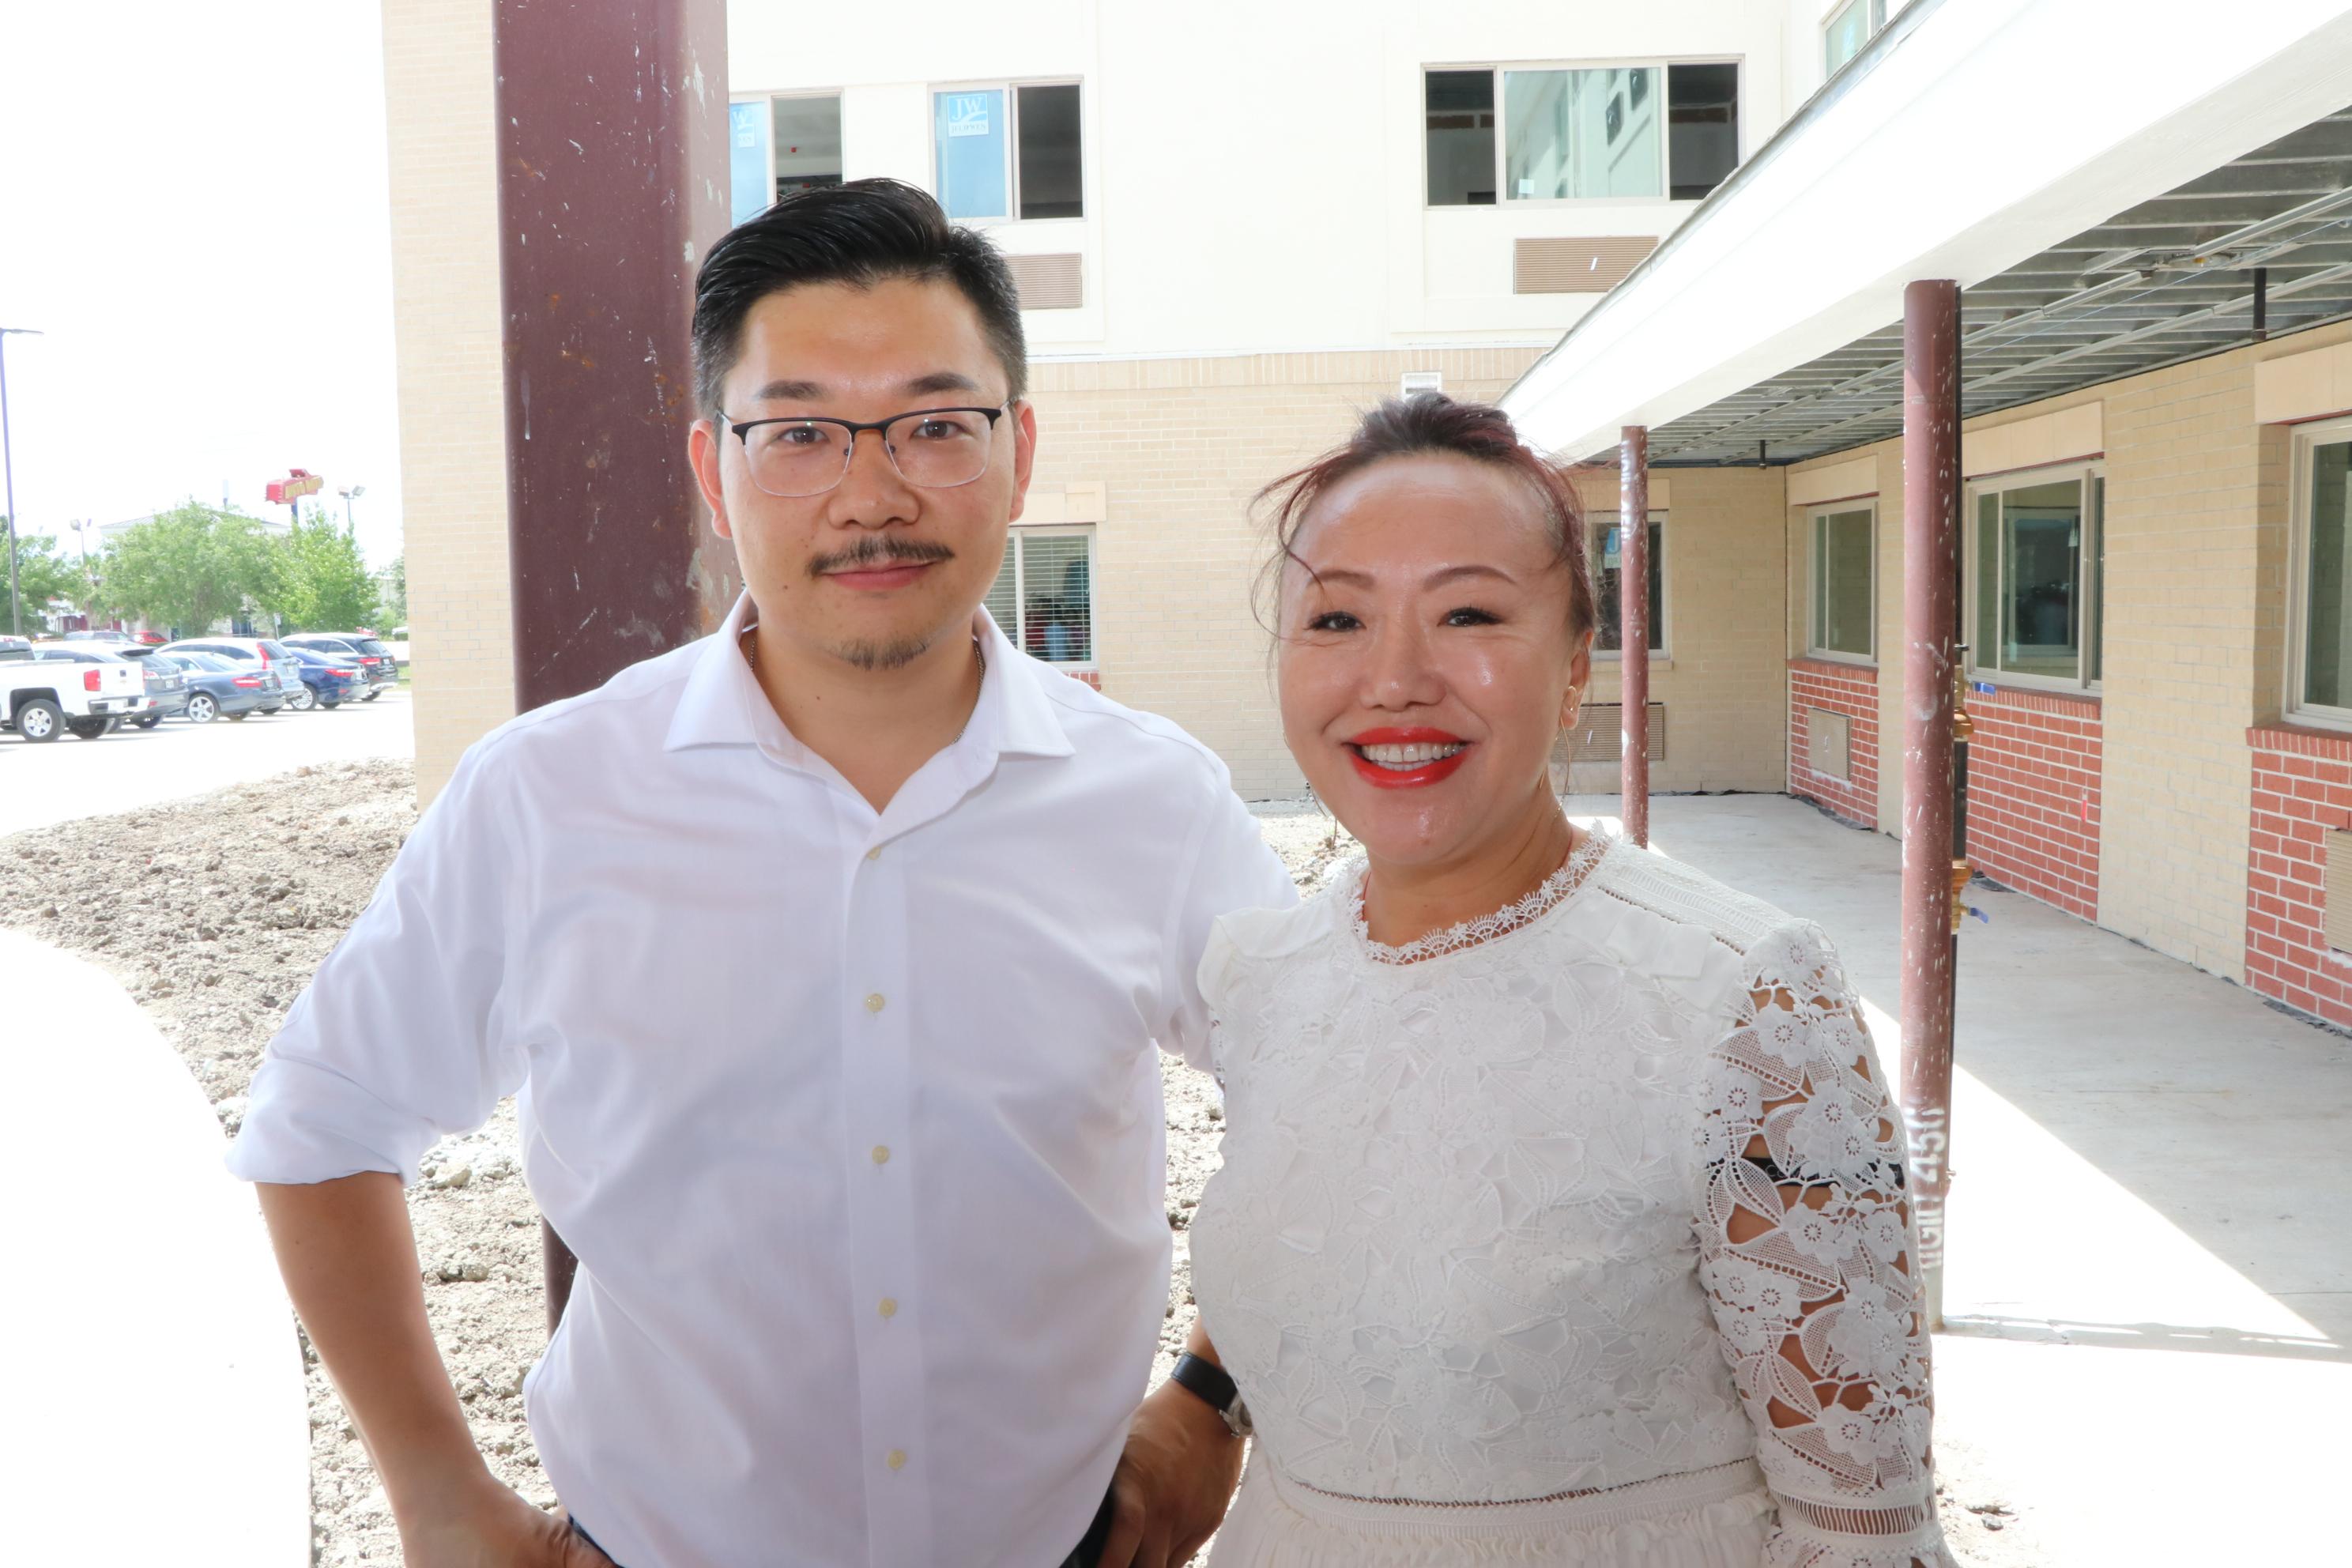 Keller Williams專業地產經紀人王藝達(右)與天慶集團總裁東昊益,在松園居相見歡。